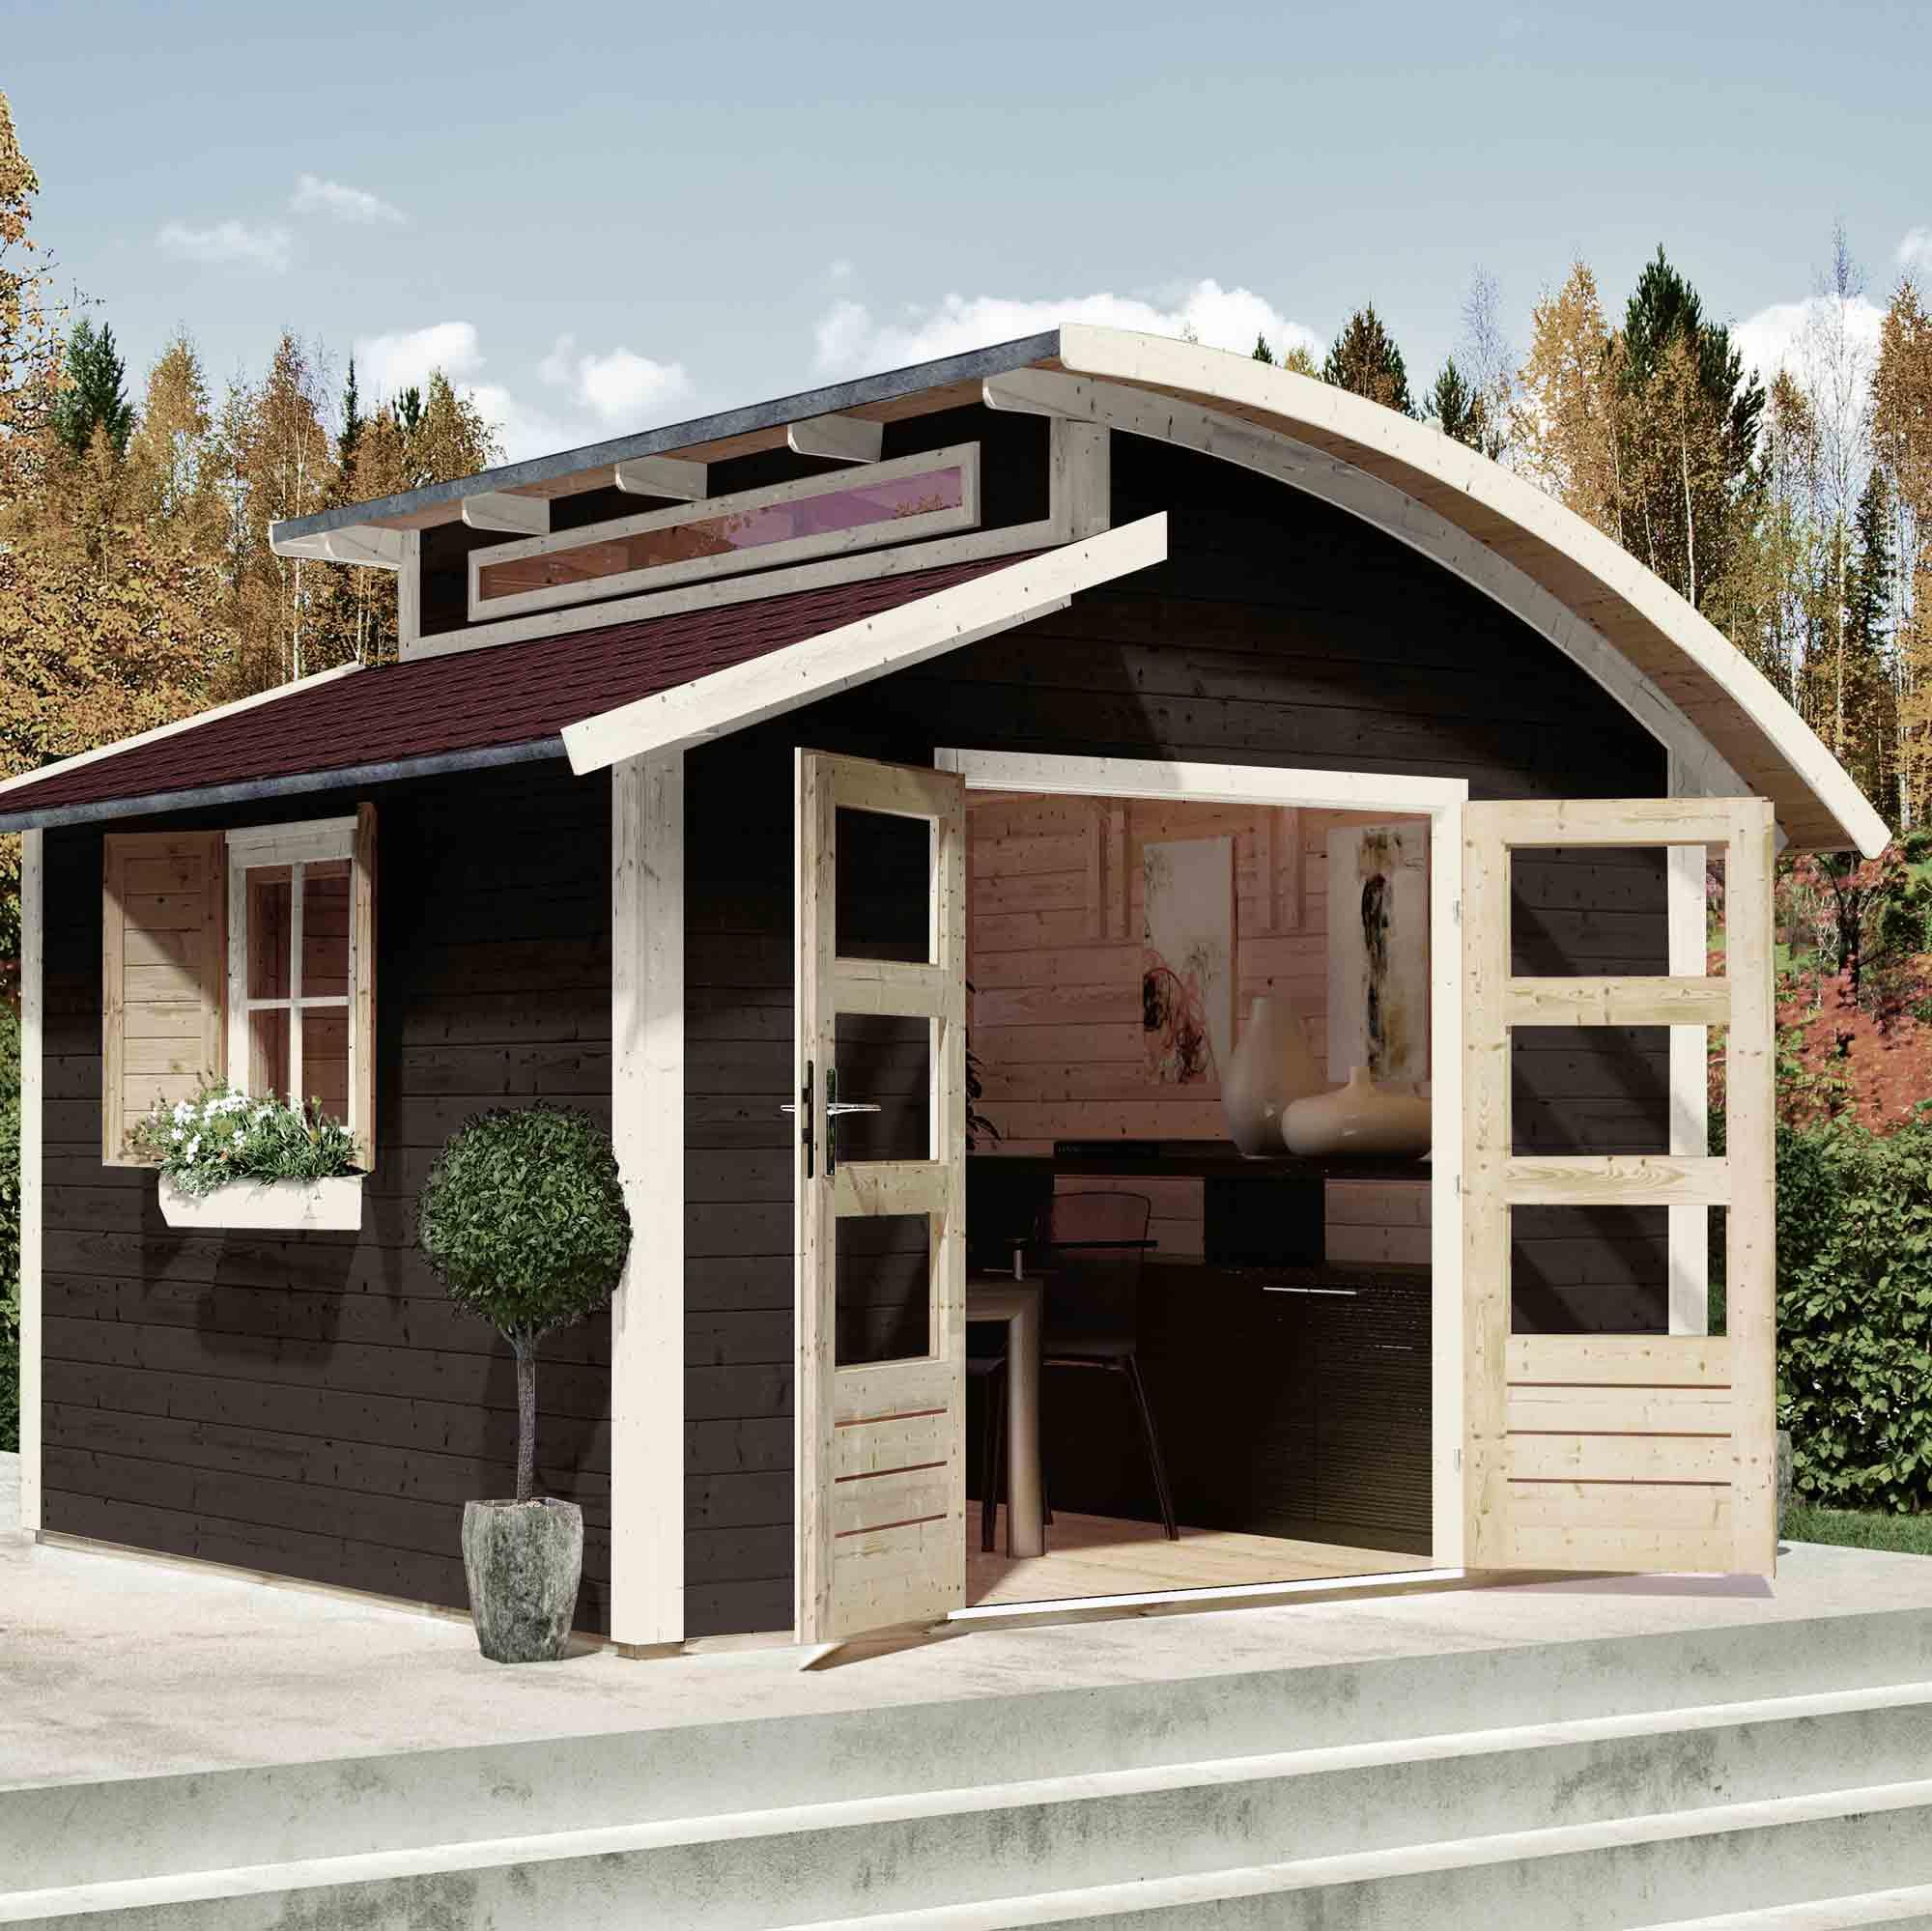 Bekannt Geräumige Gartenhäuser | HolzLand Verbeek | Straelen ZS99